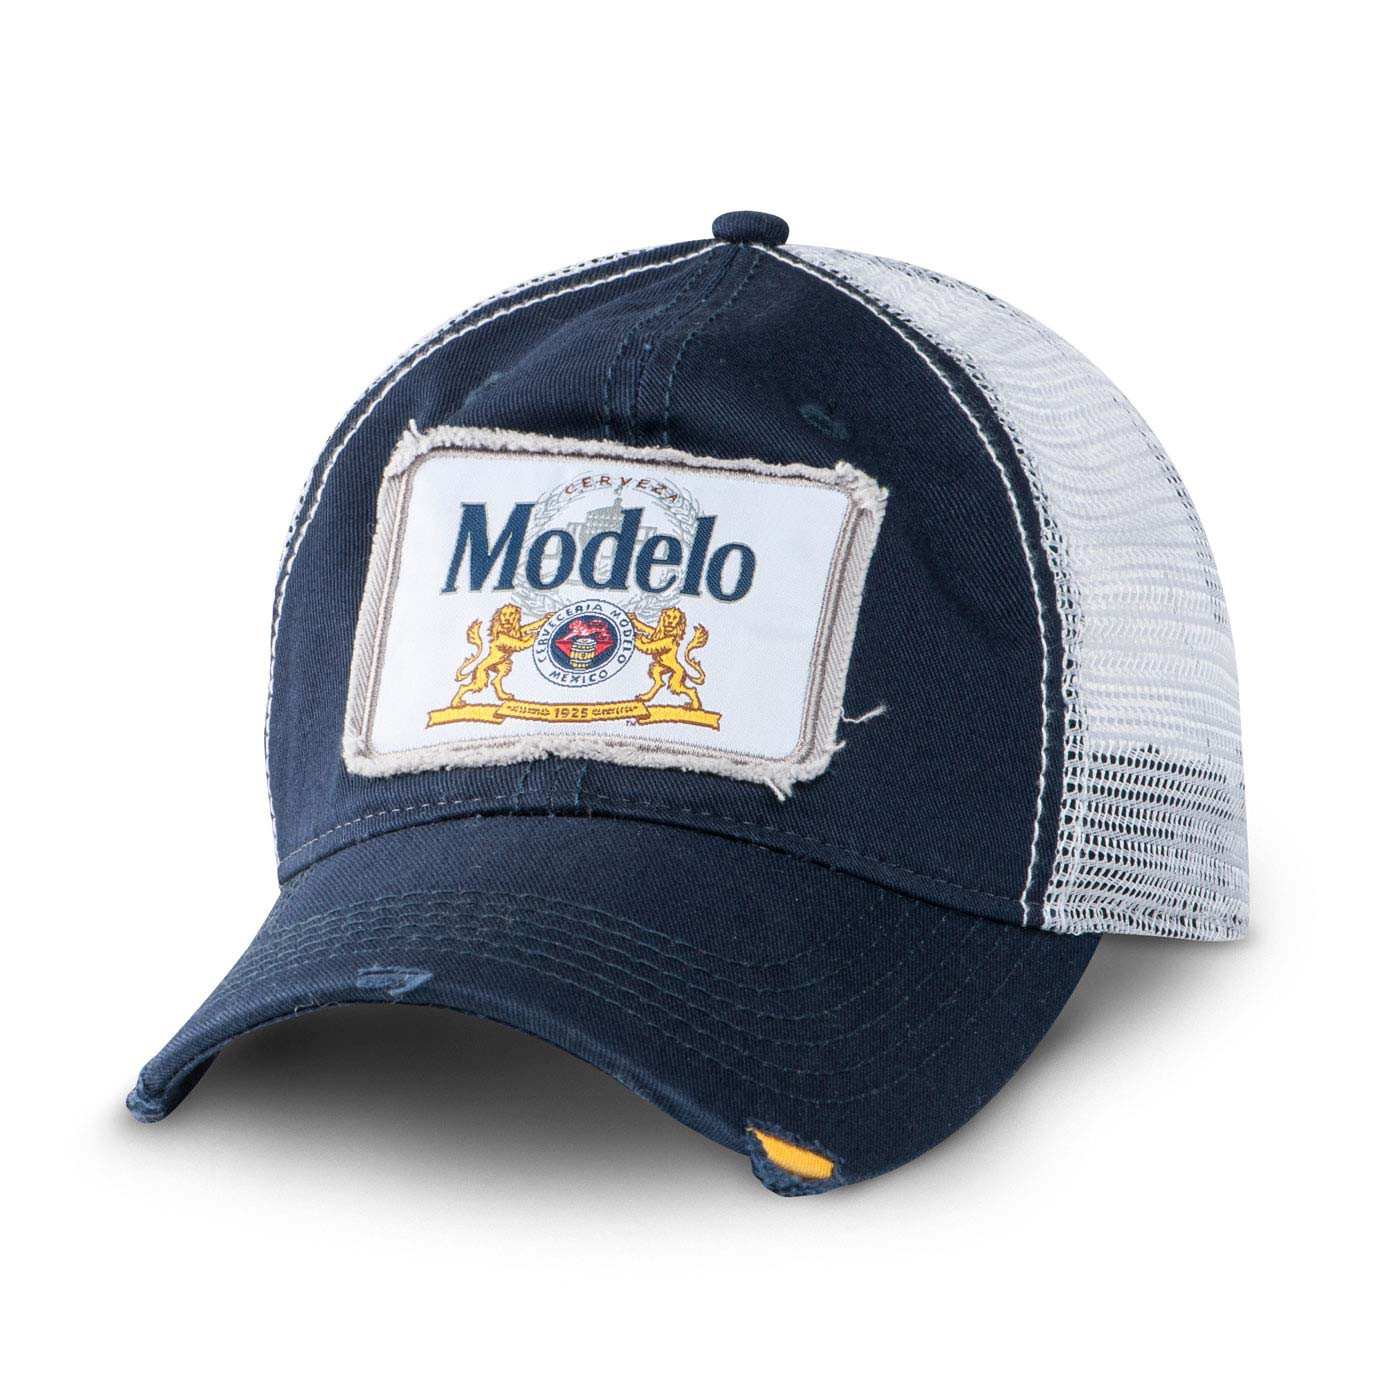 Modelo Especial Chino Mesh Trucker Hat